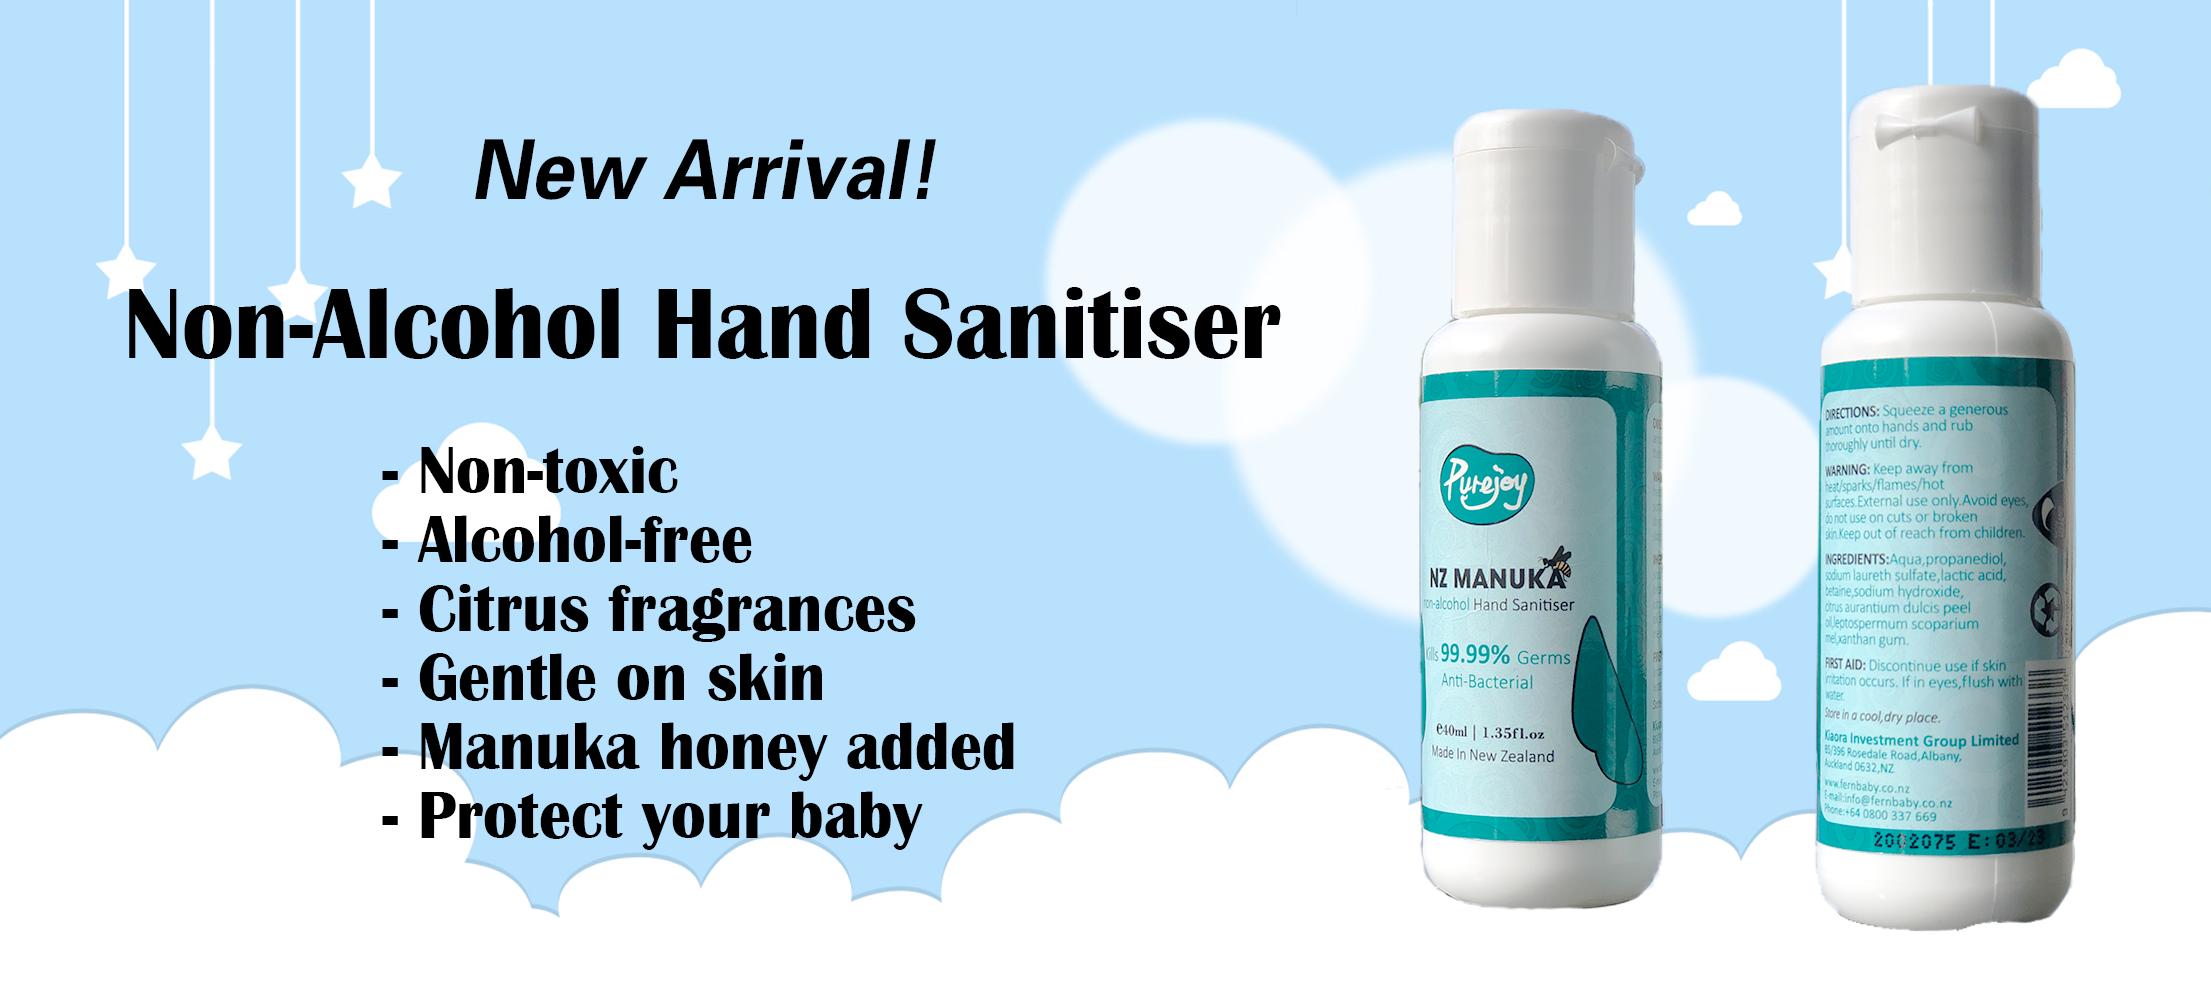 Purejoy Hand Sanitiser